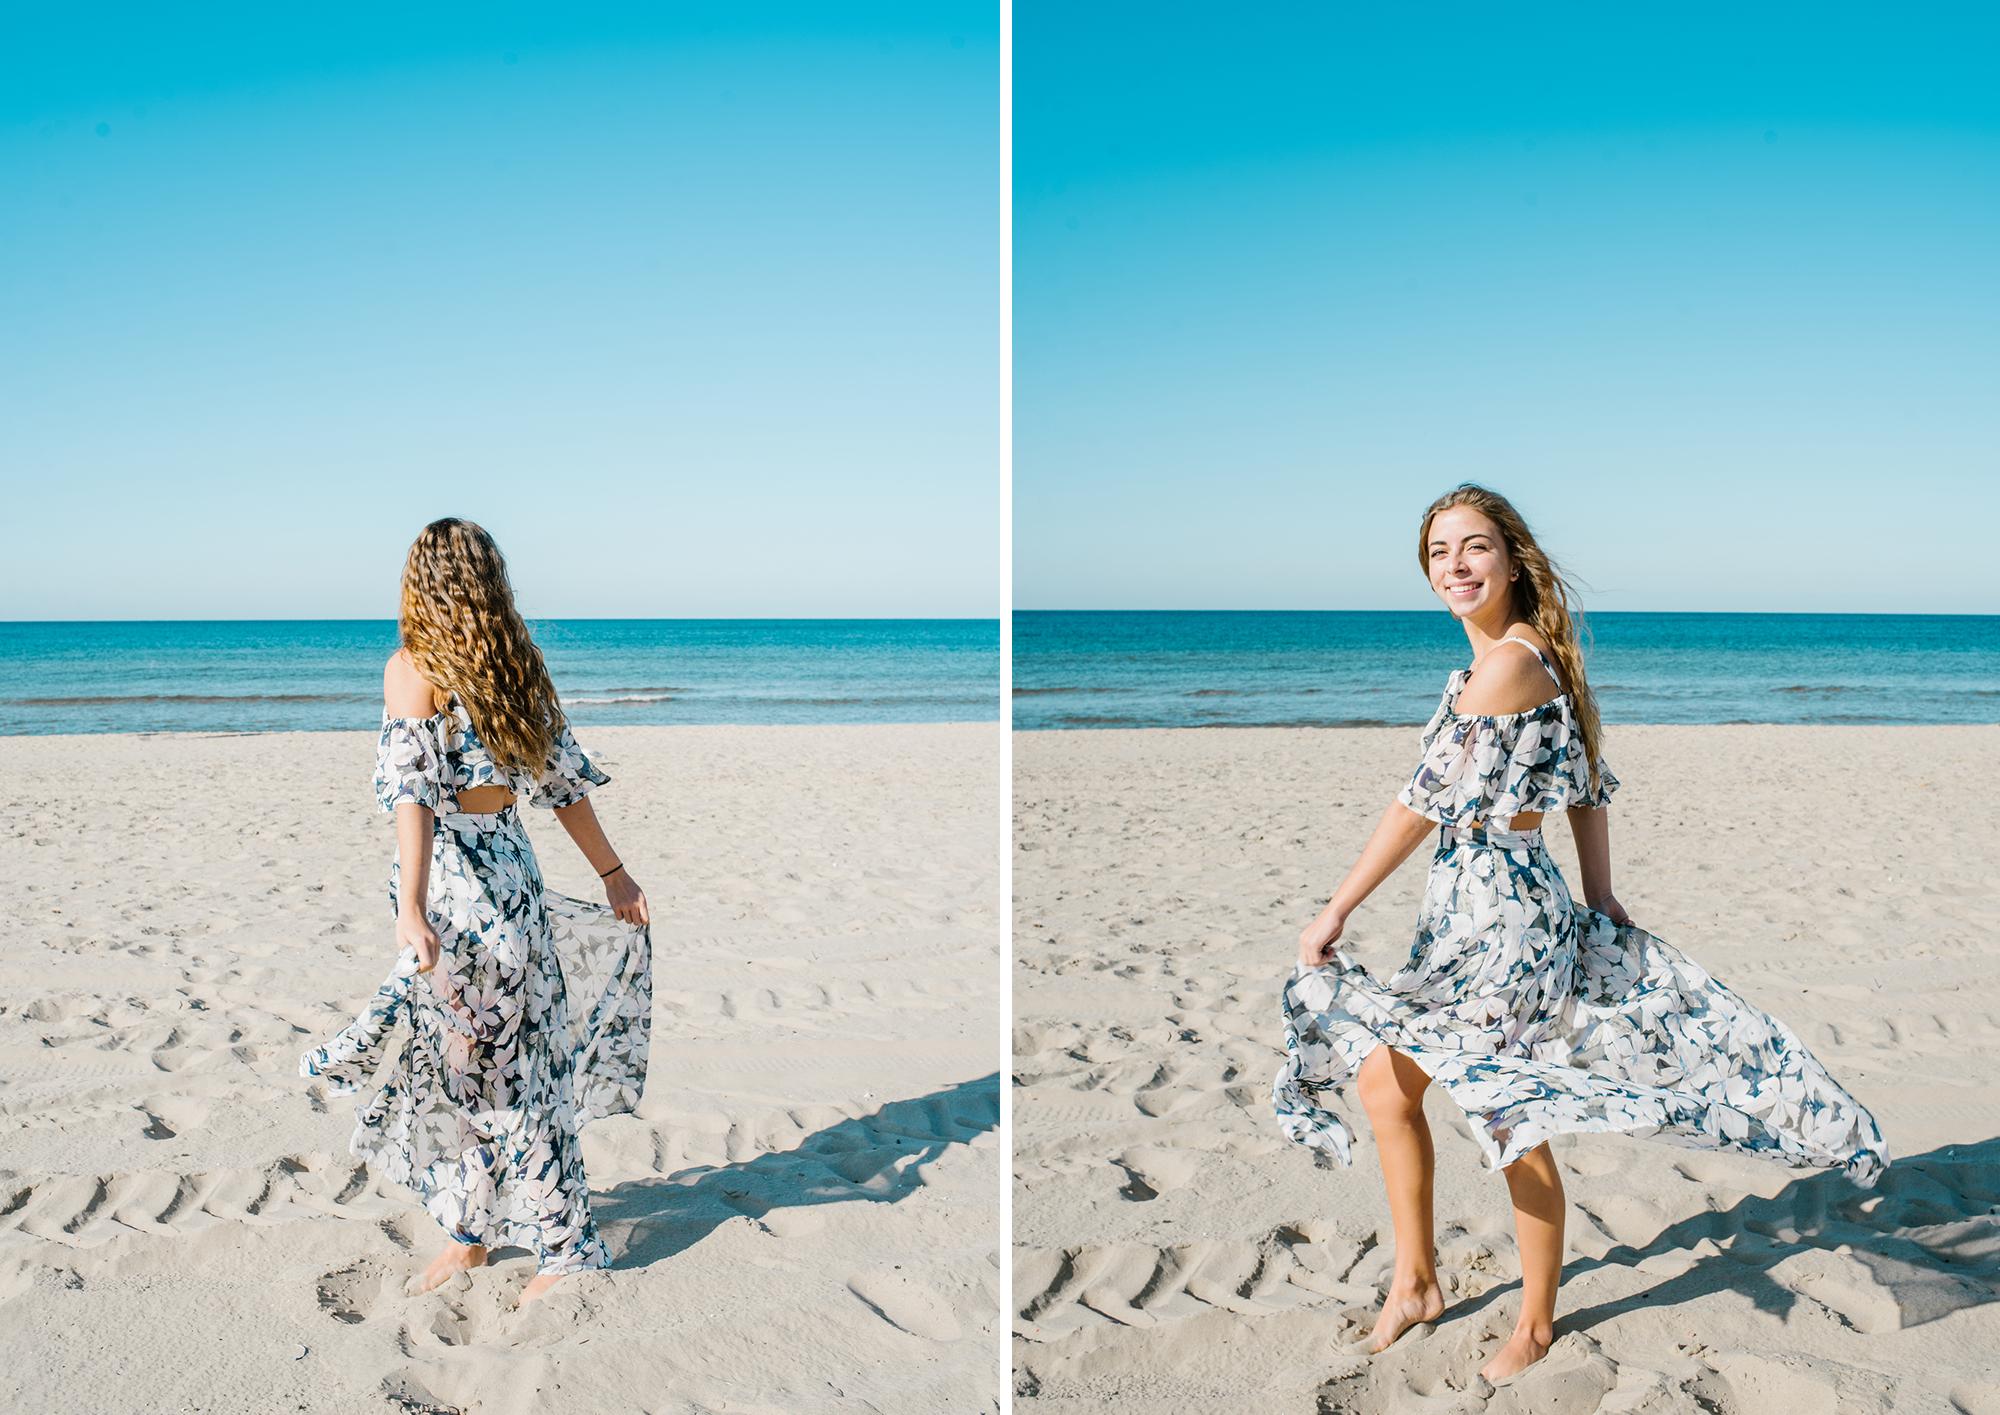 grand-haven-beach-high-school-senior-photographer-sydney-marie.png